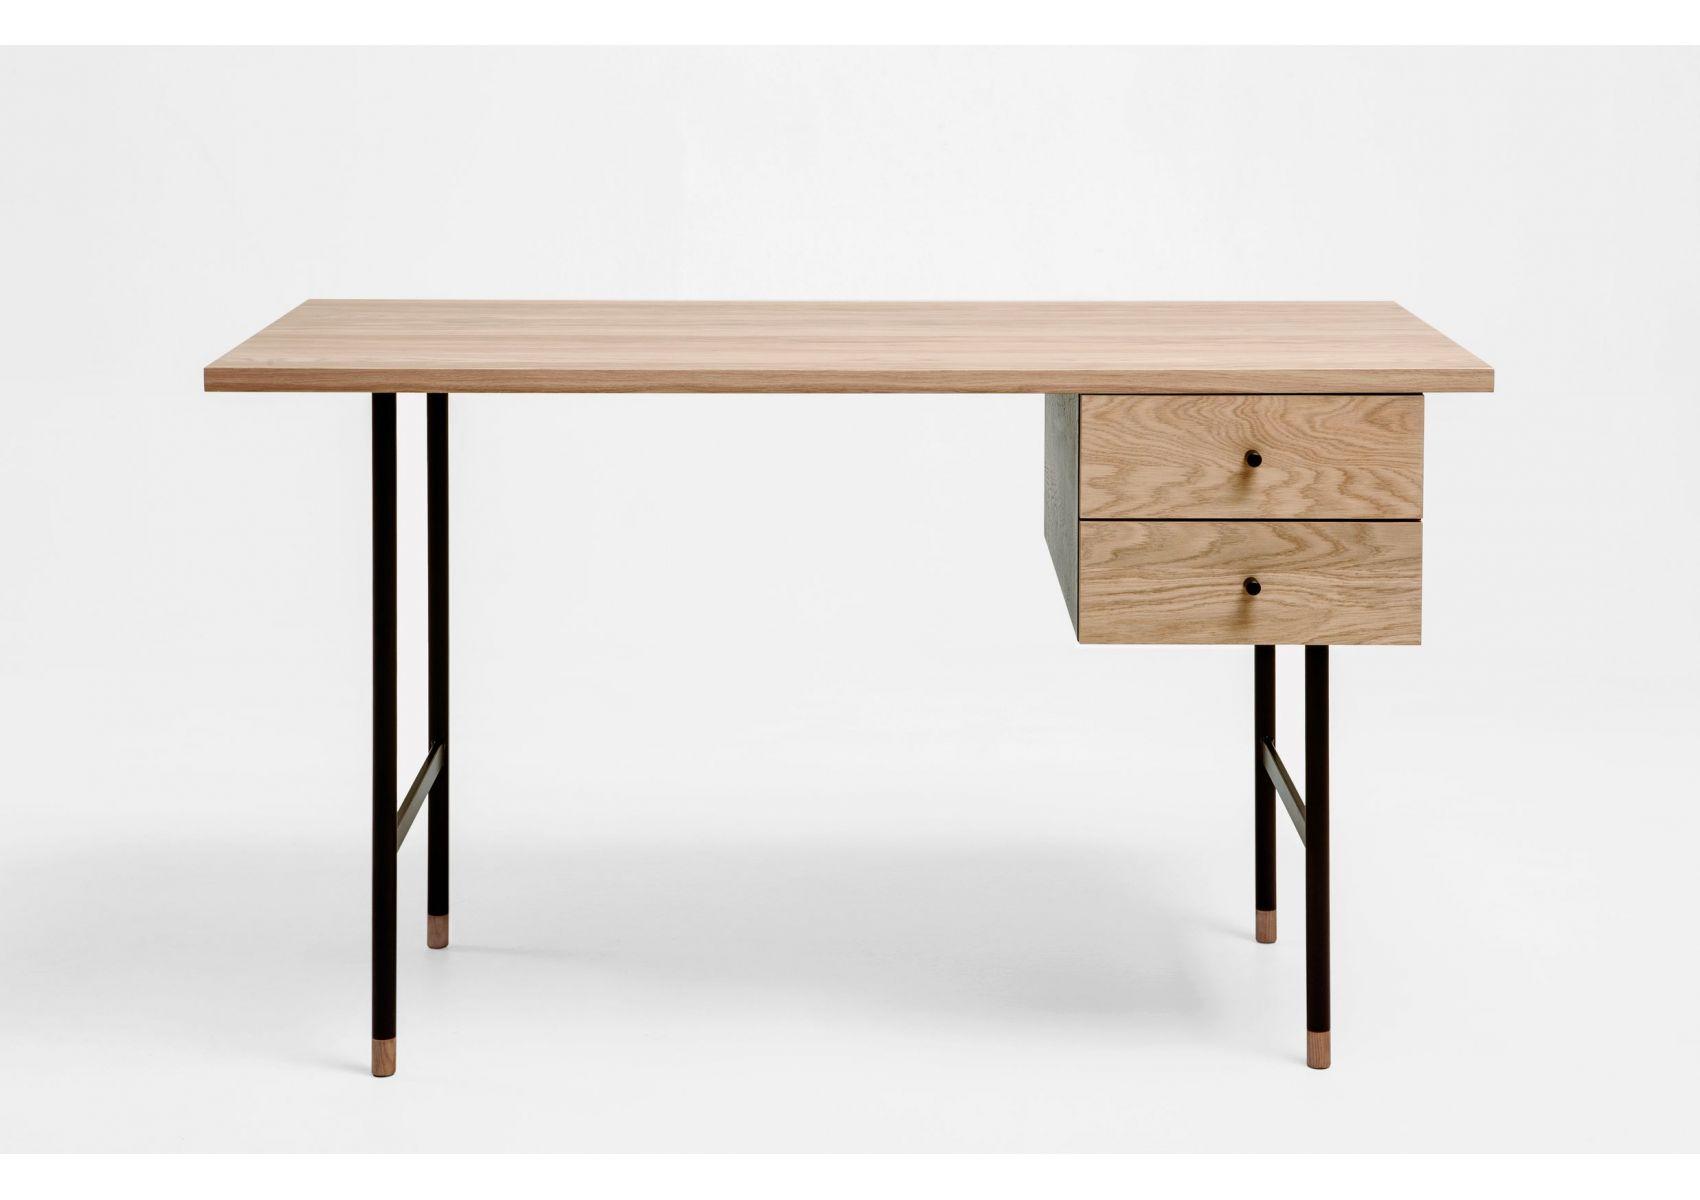 bureau vintage et industriel jugend de chez woodman. Black Bedroom Furniture Sets. Home Design Ideas